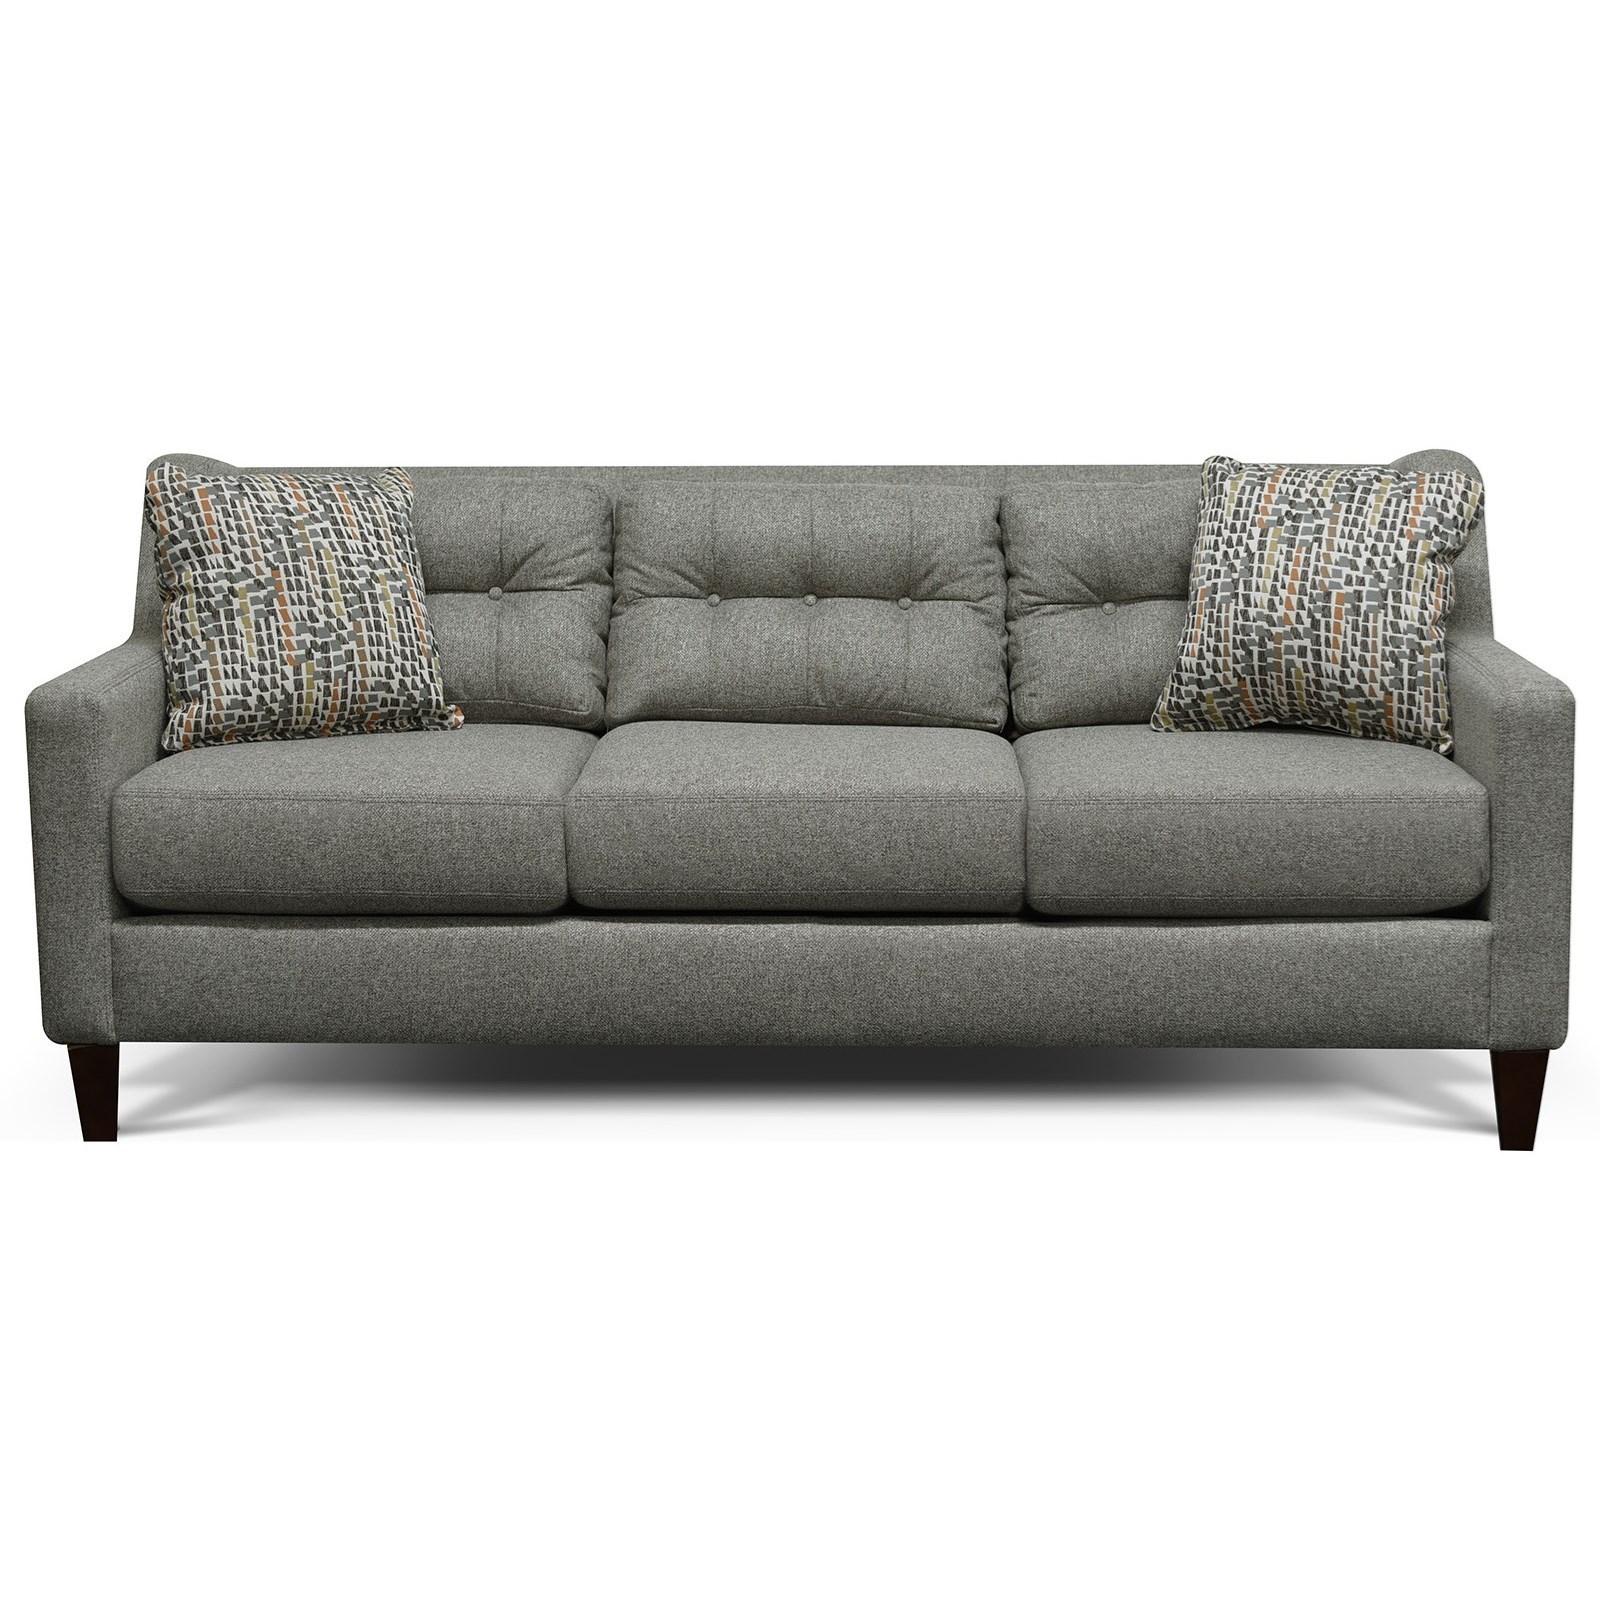 England Brody Tufted Back Sofa